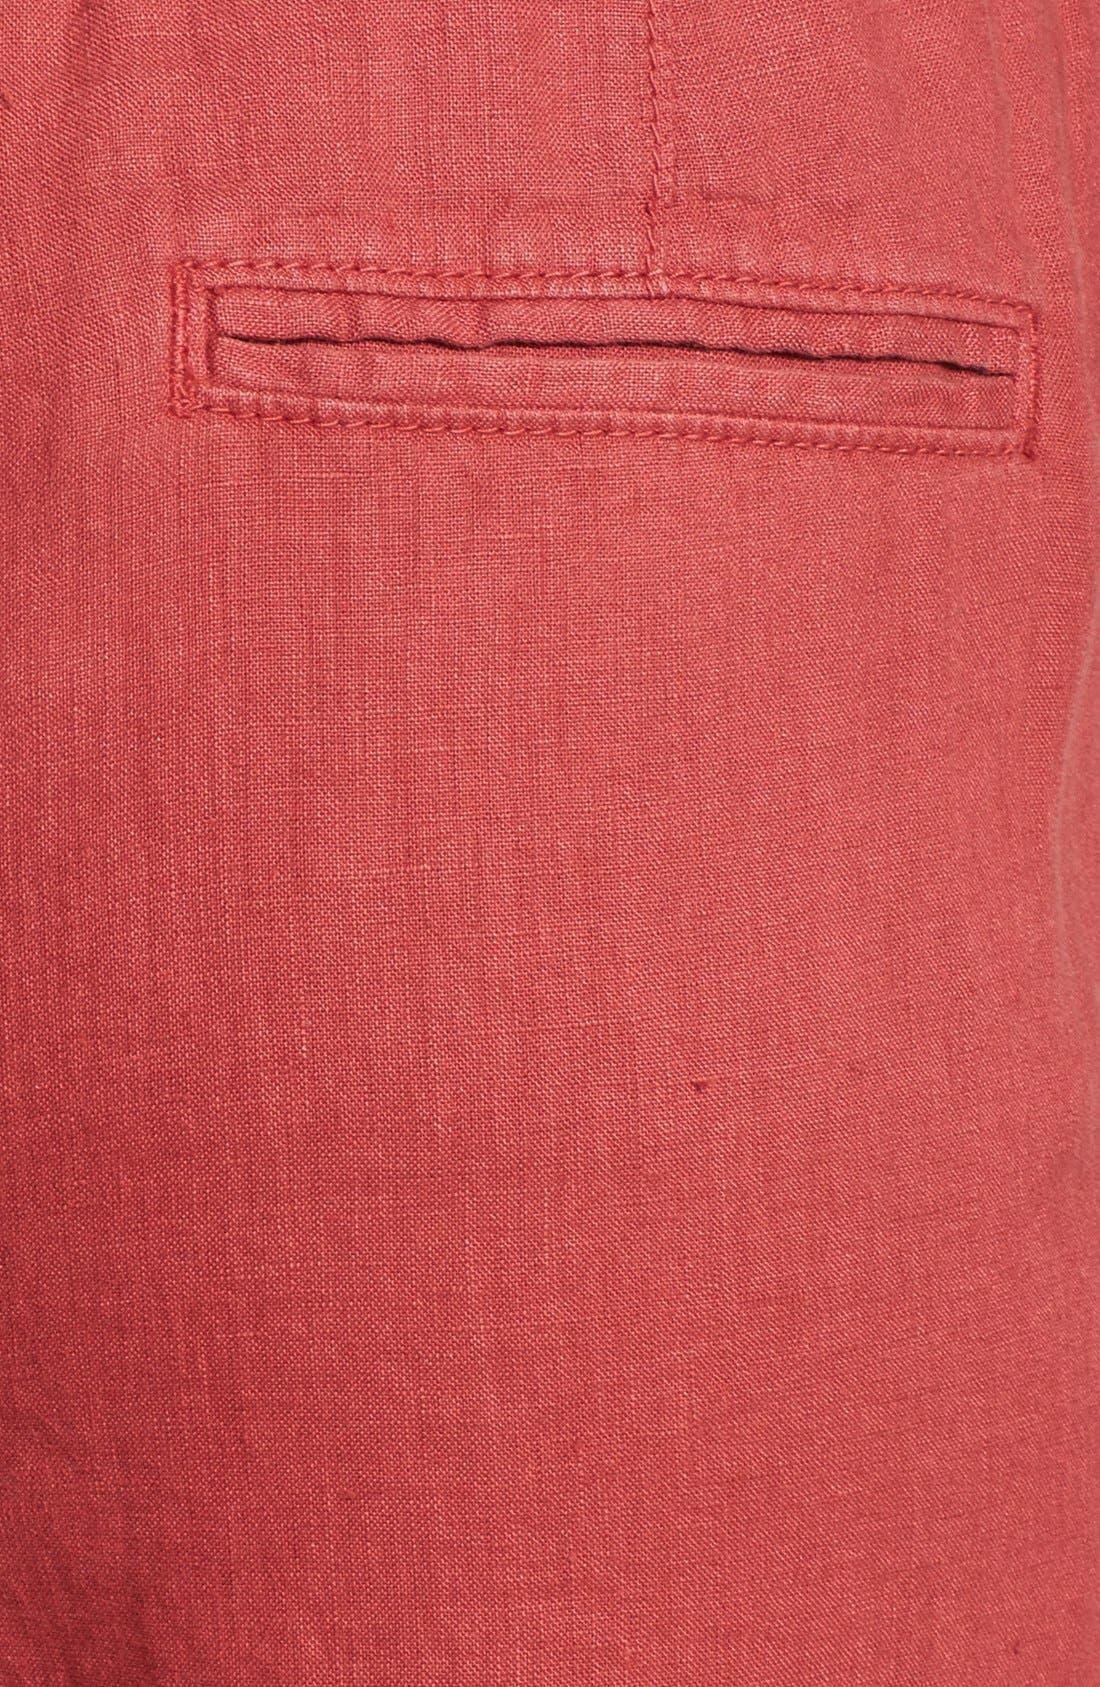 Alternate Image 3  - Caslon® Drawstring Waist Linen Pants (Regular & Petite)